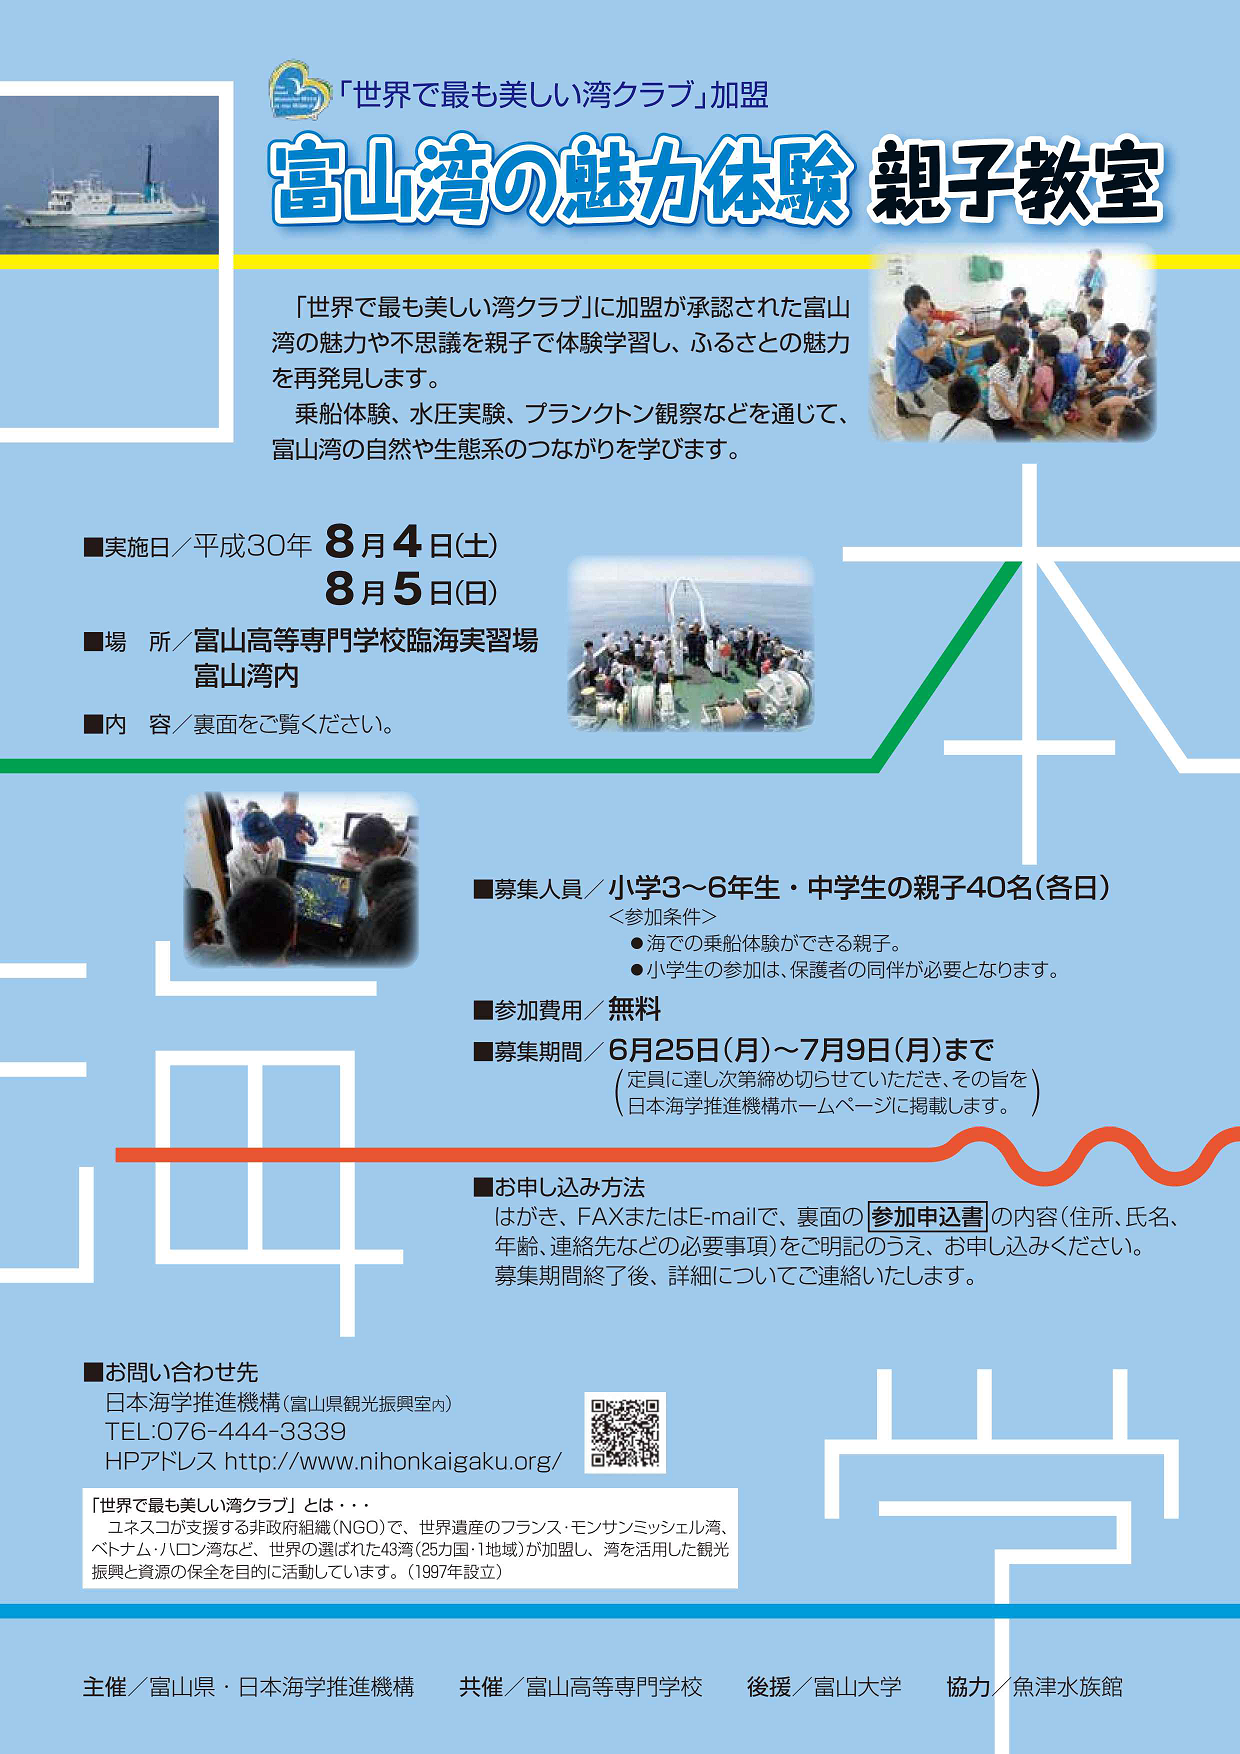 http://www.nihonkaigaku.org/event/oyako%202018.png